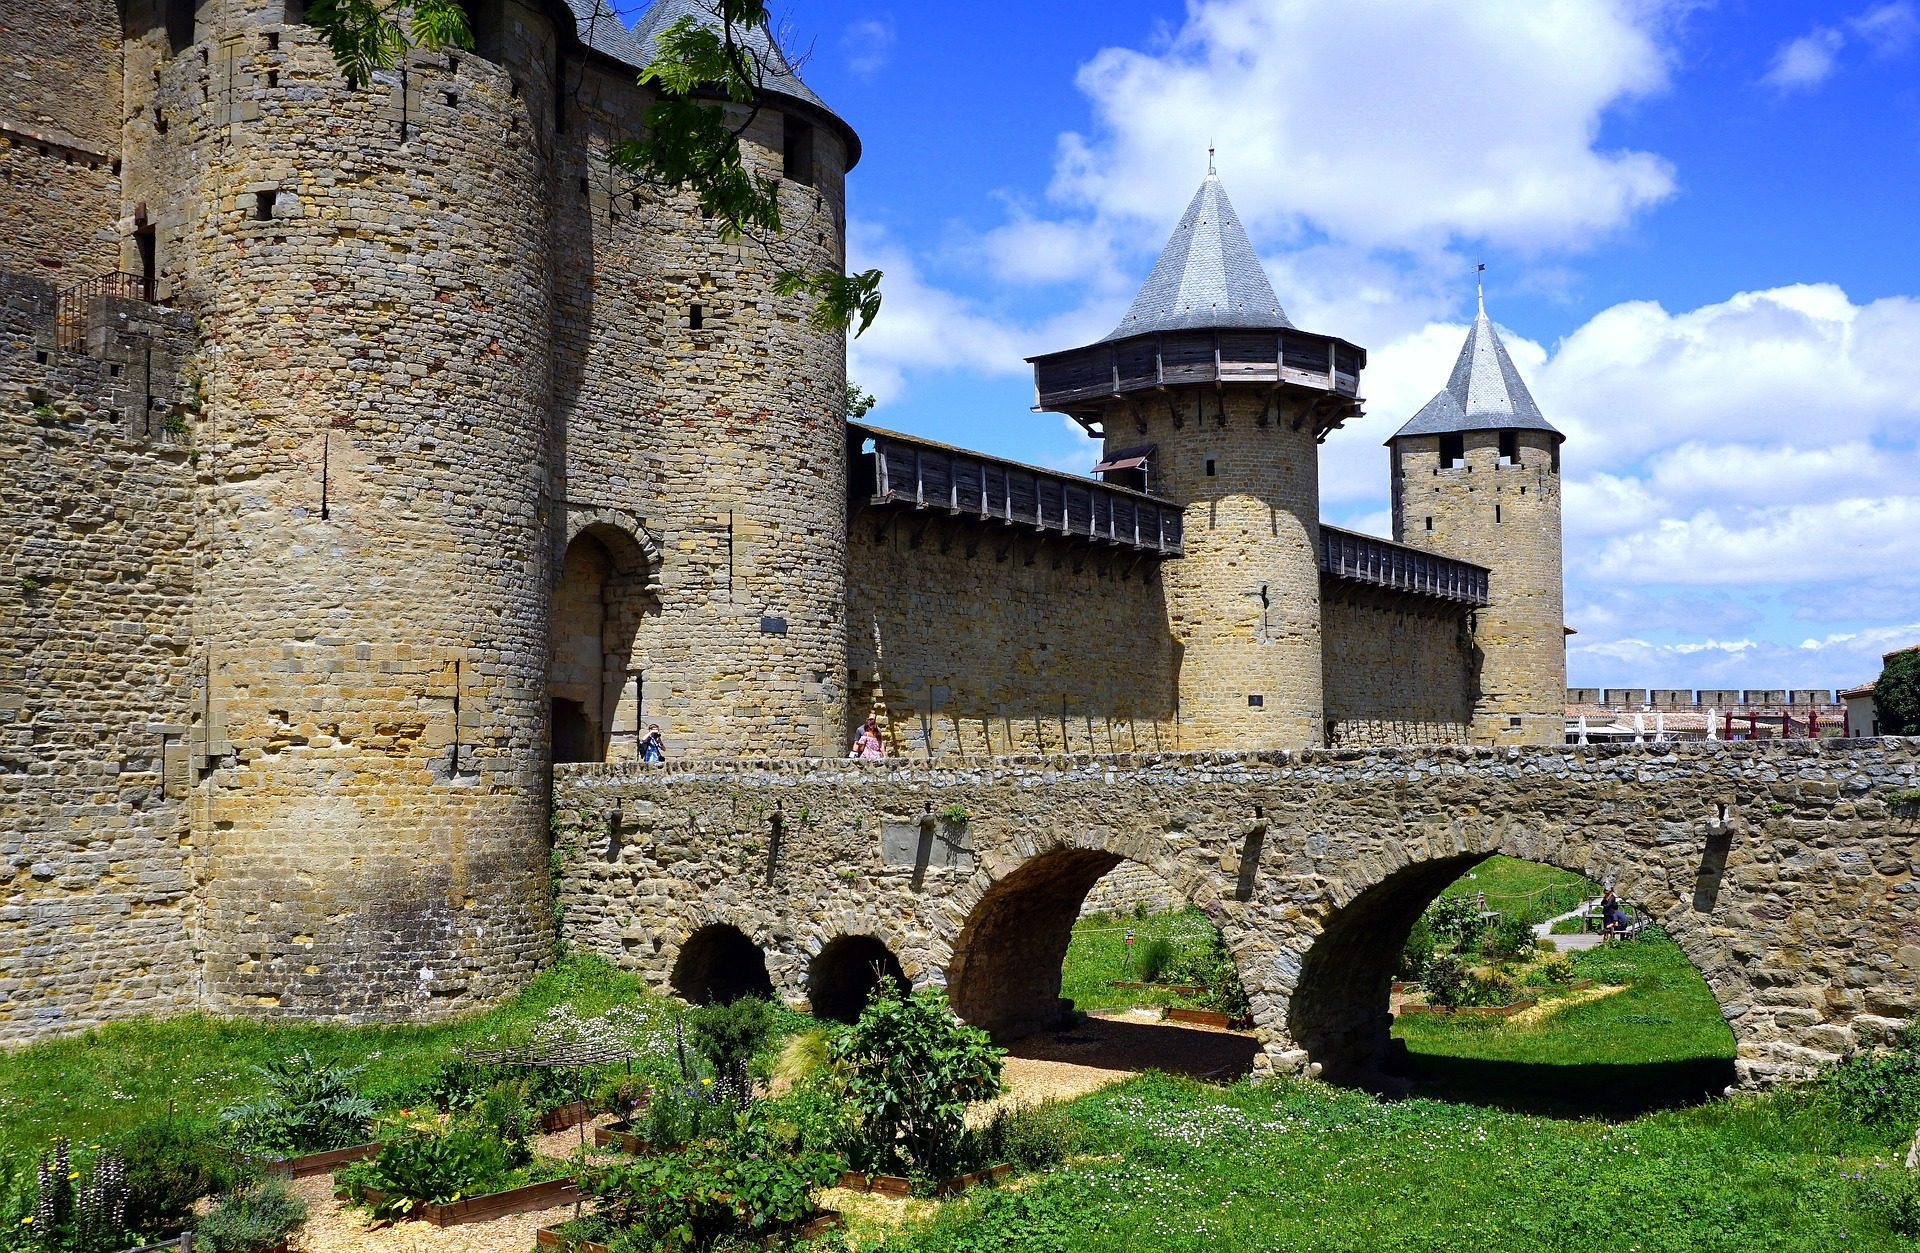 Schloss, Festung, Brücke, Torres, mittelalterliche, Frankreich - Wallpaper HD - Prof.-falken.com